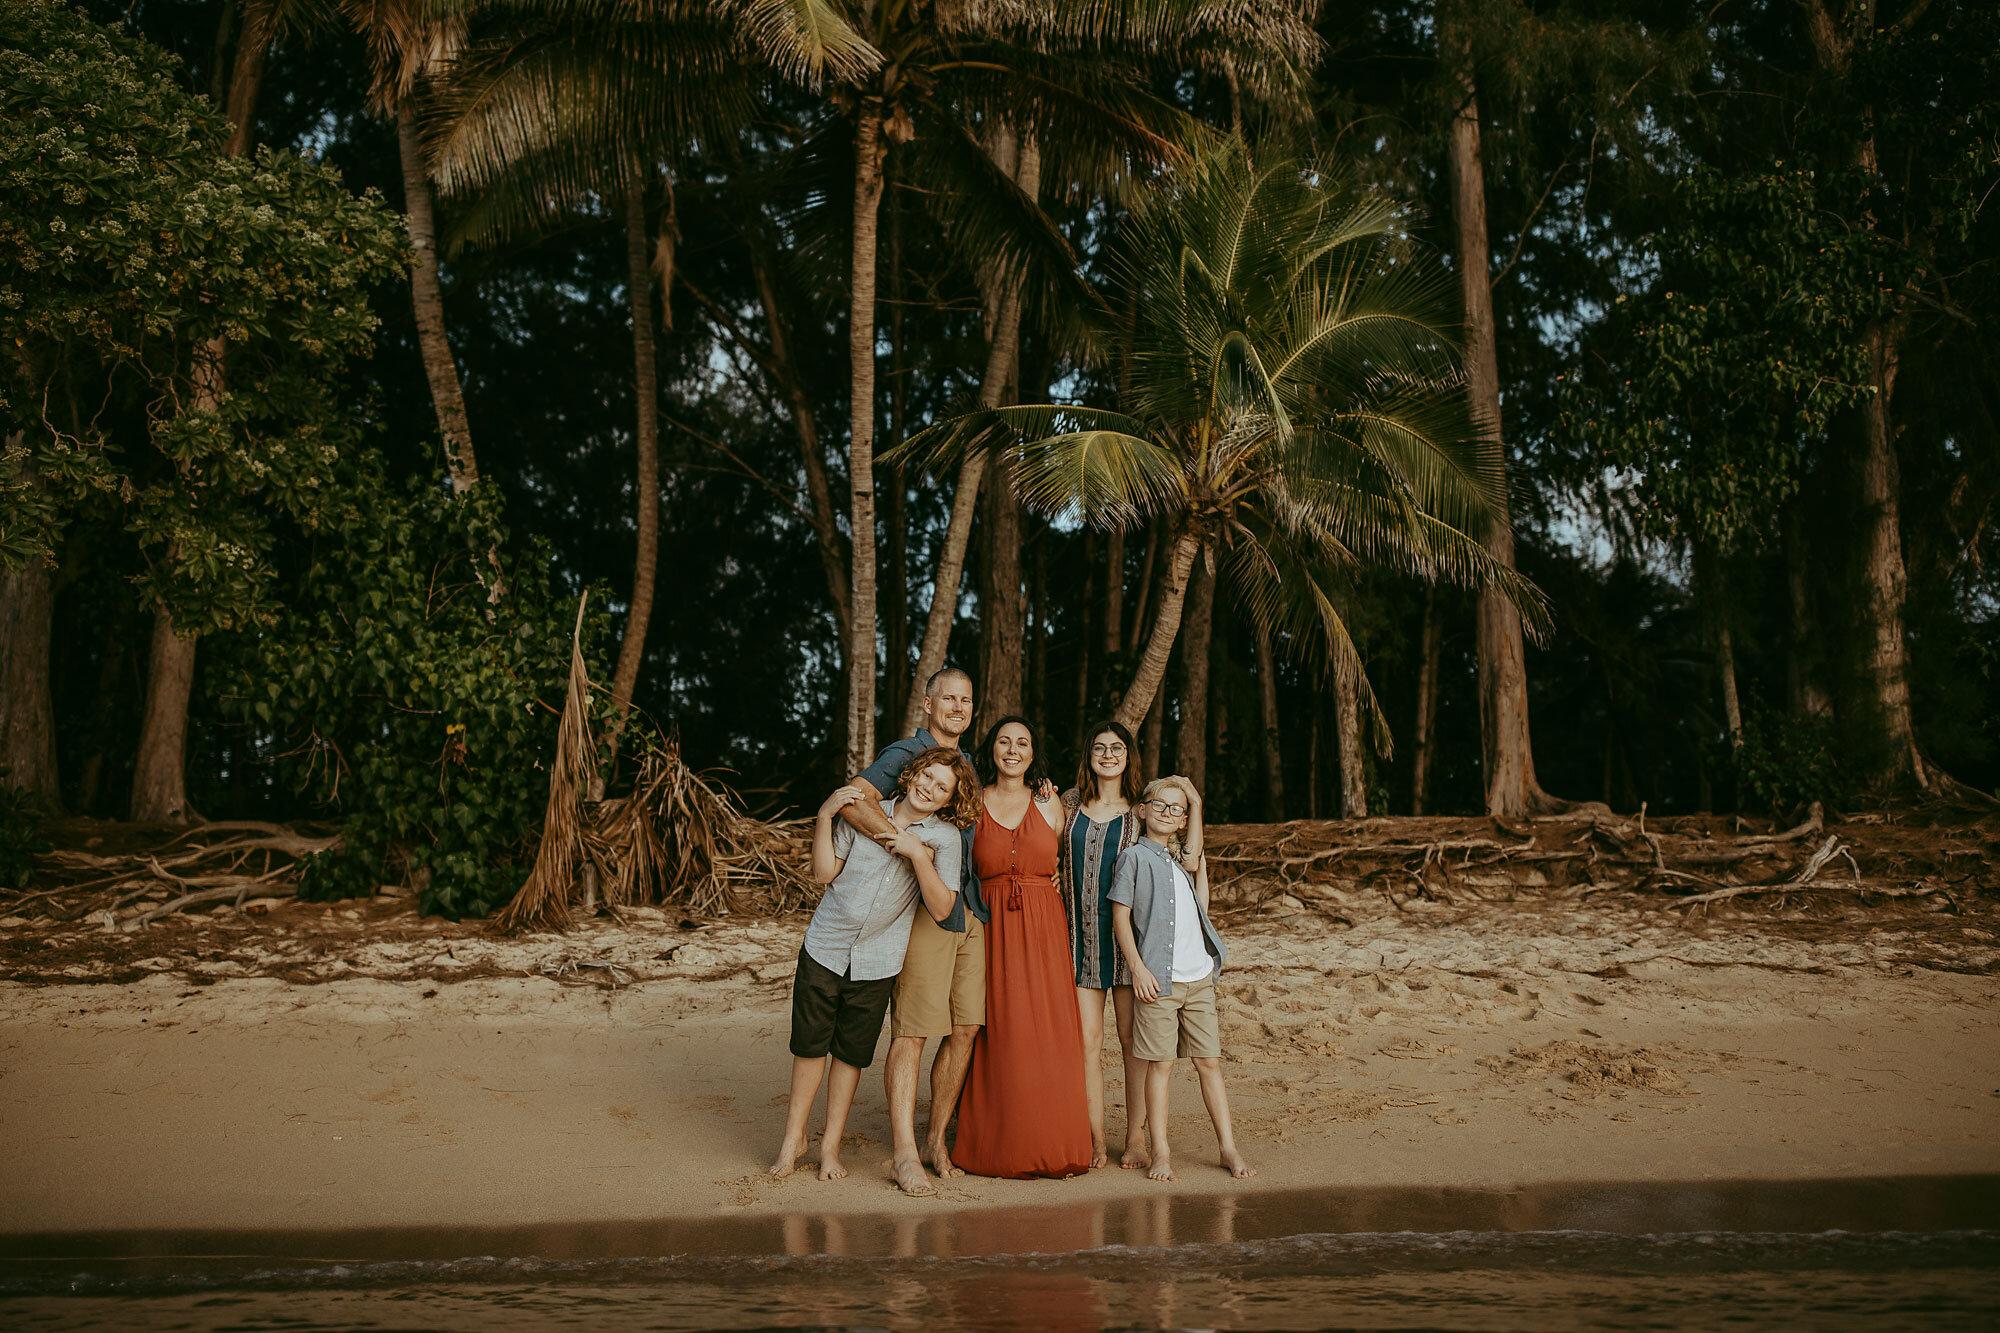 Oahu-Hawaii-Family-Photography-Family-Photos-12.jpg